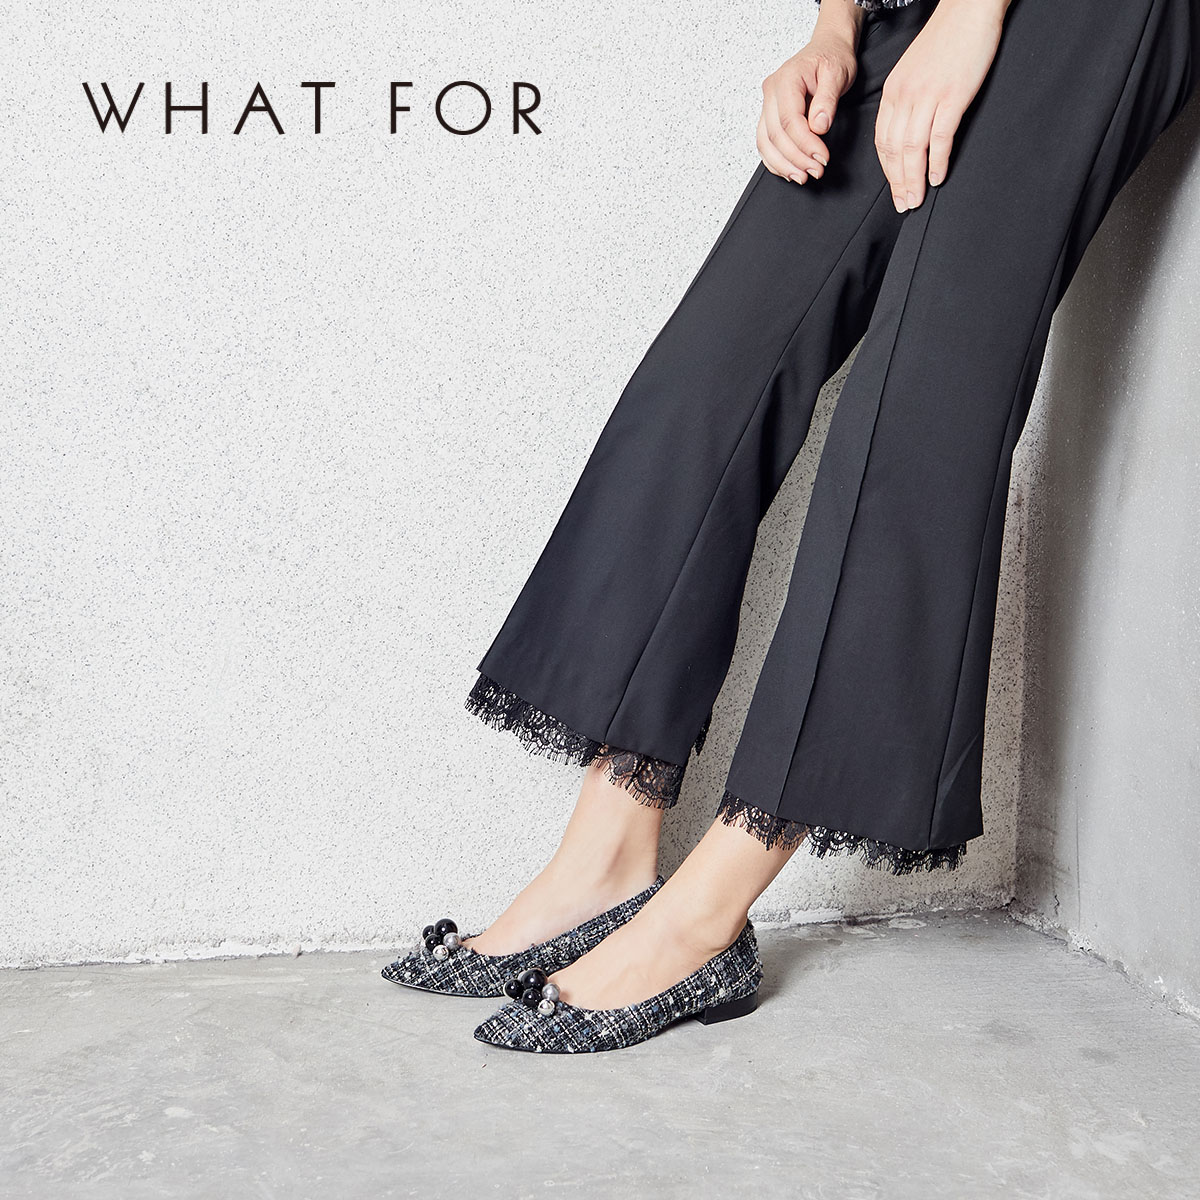 WHAT FOR2018秋季新款珍珠浅口尖头低跟平底鞋chic女单鞋